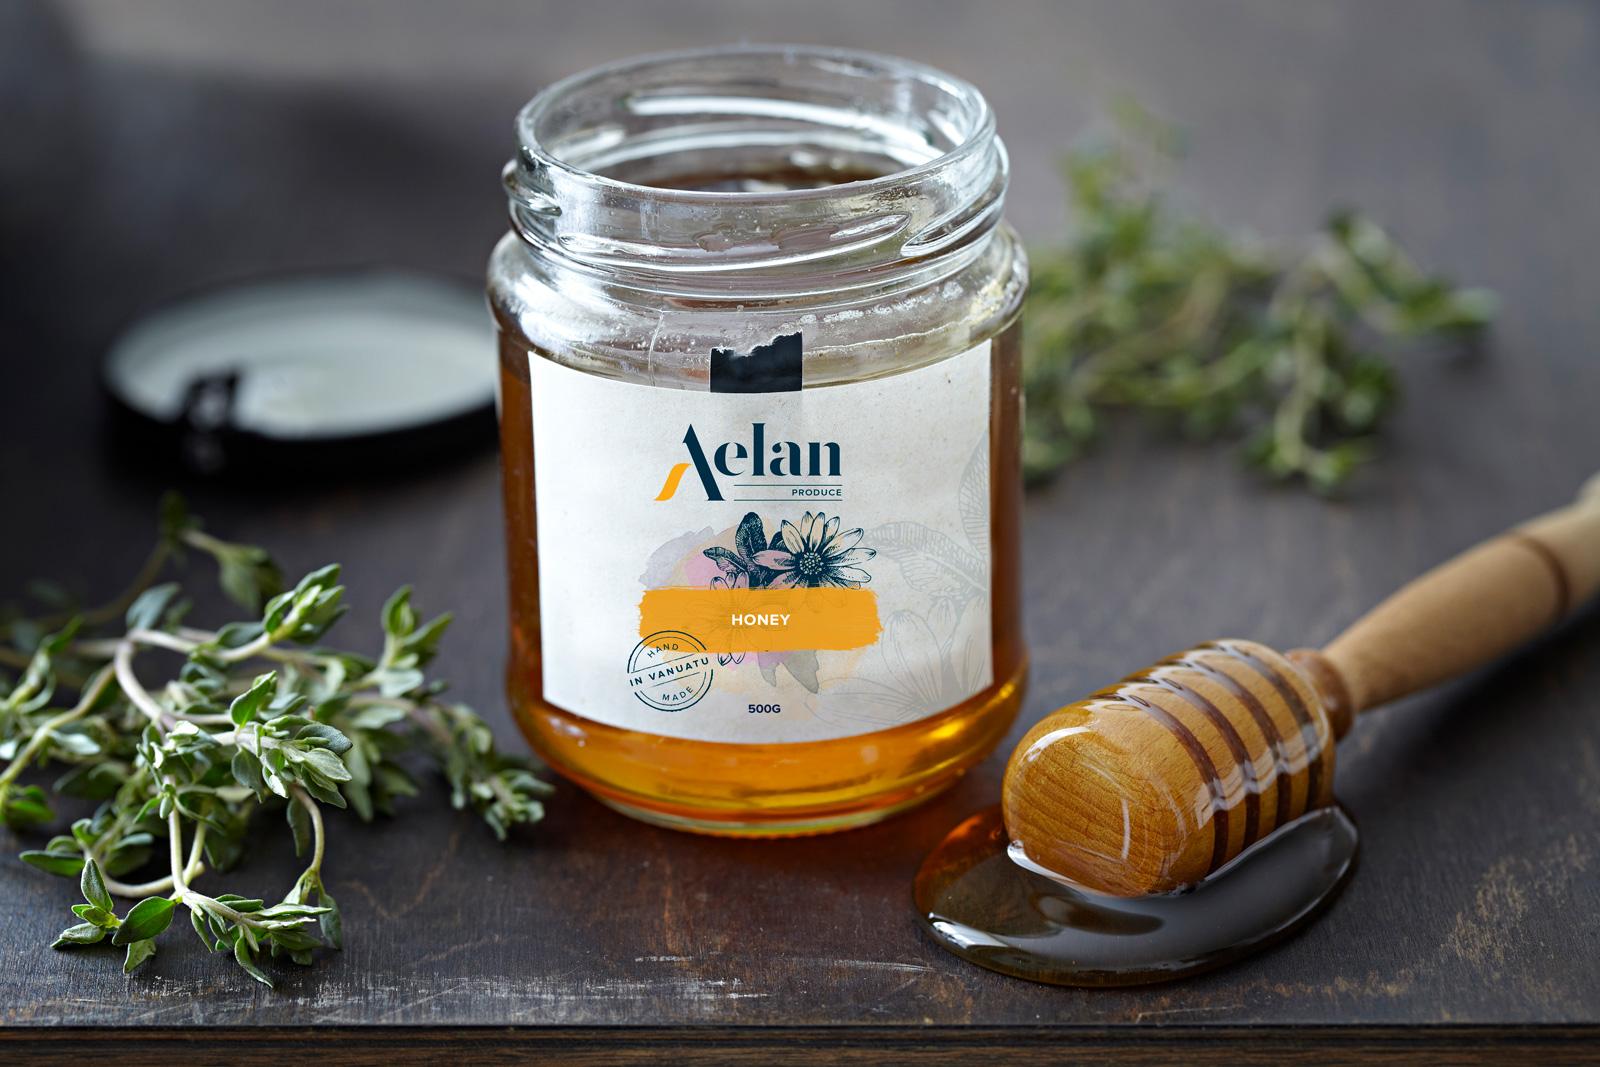 Aelan-Honey_2